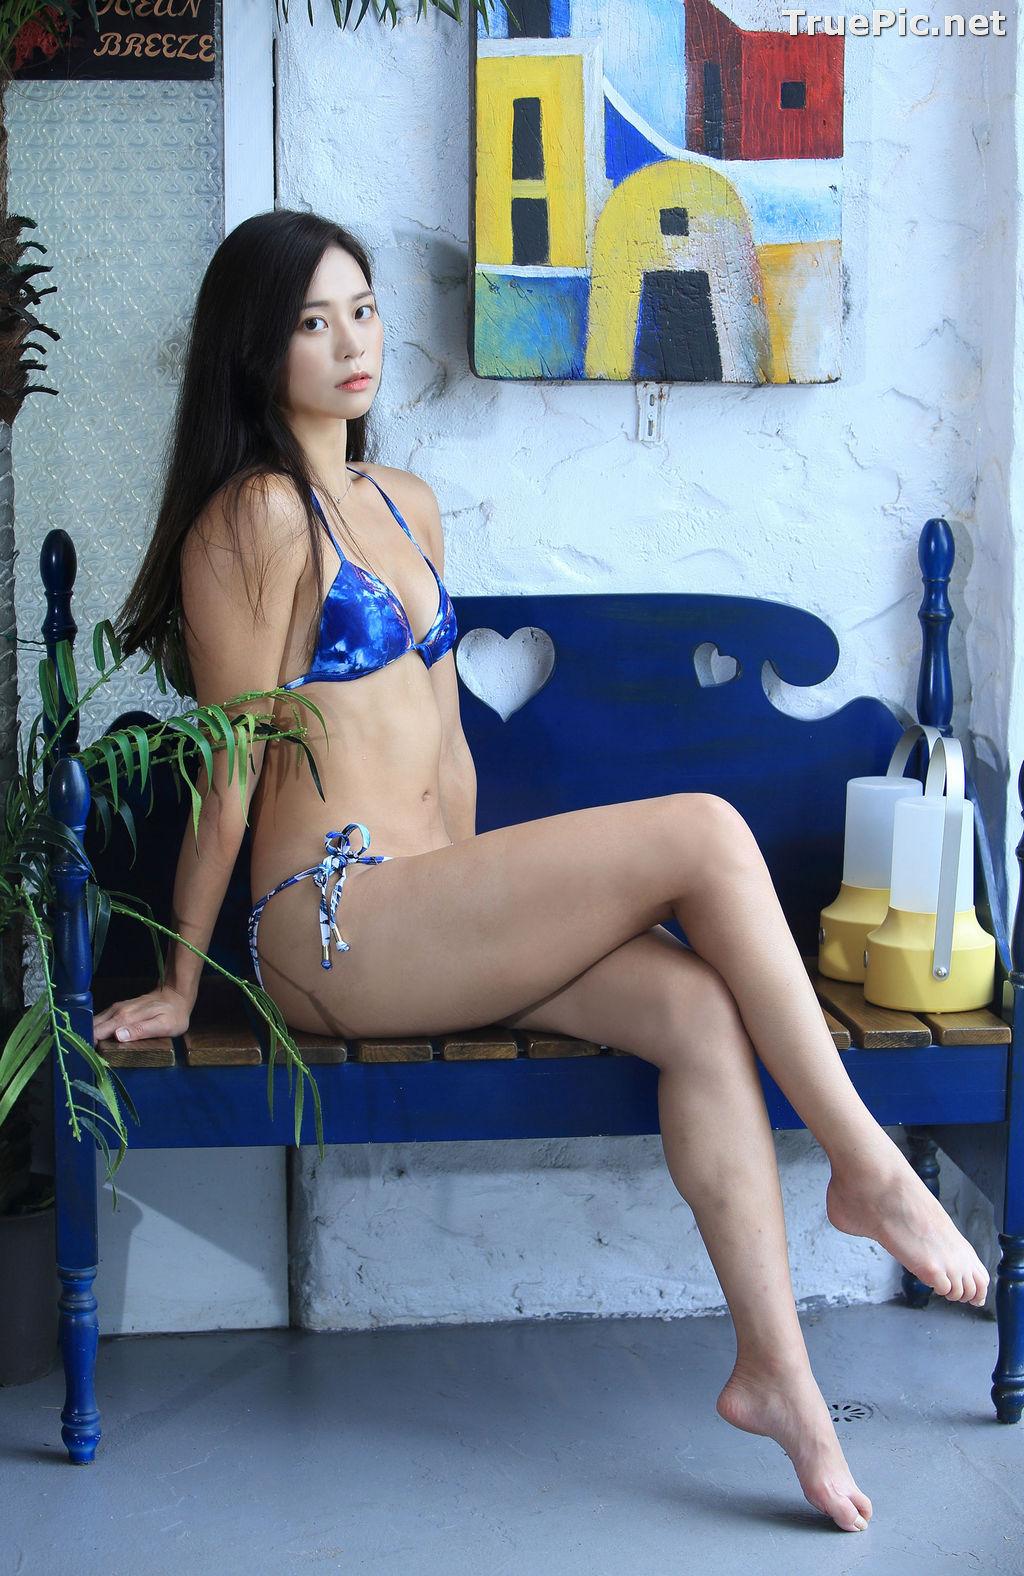 Image Taiwanese Model - Shelly - Beautiful Bodybuilding Bikini Girl - TruePic.net - Picture-17